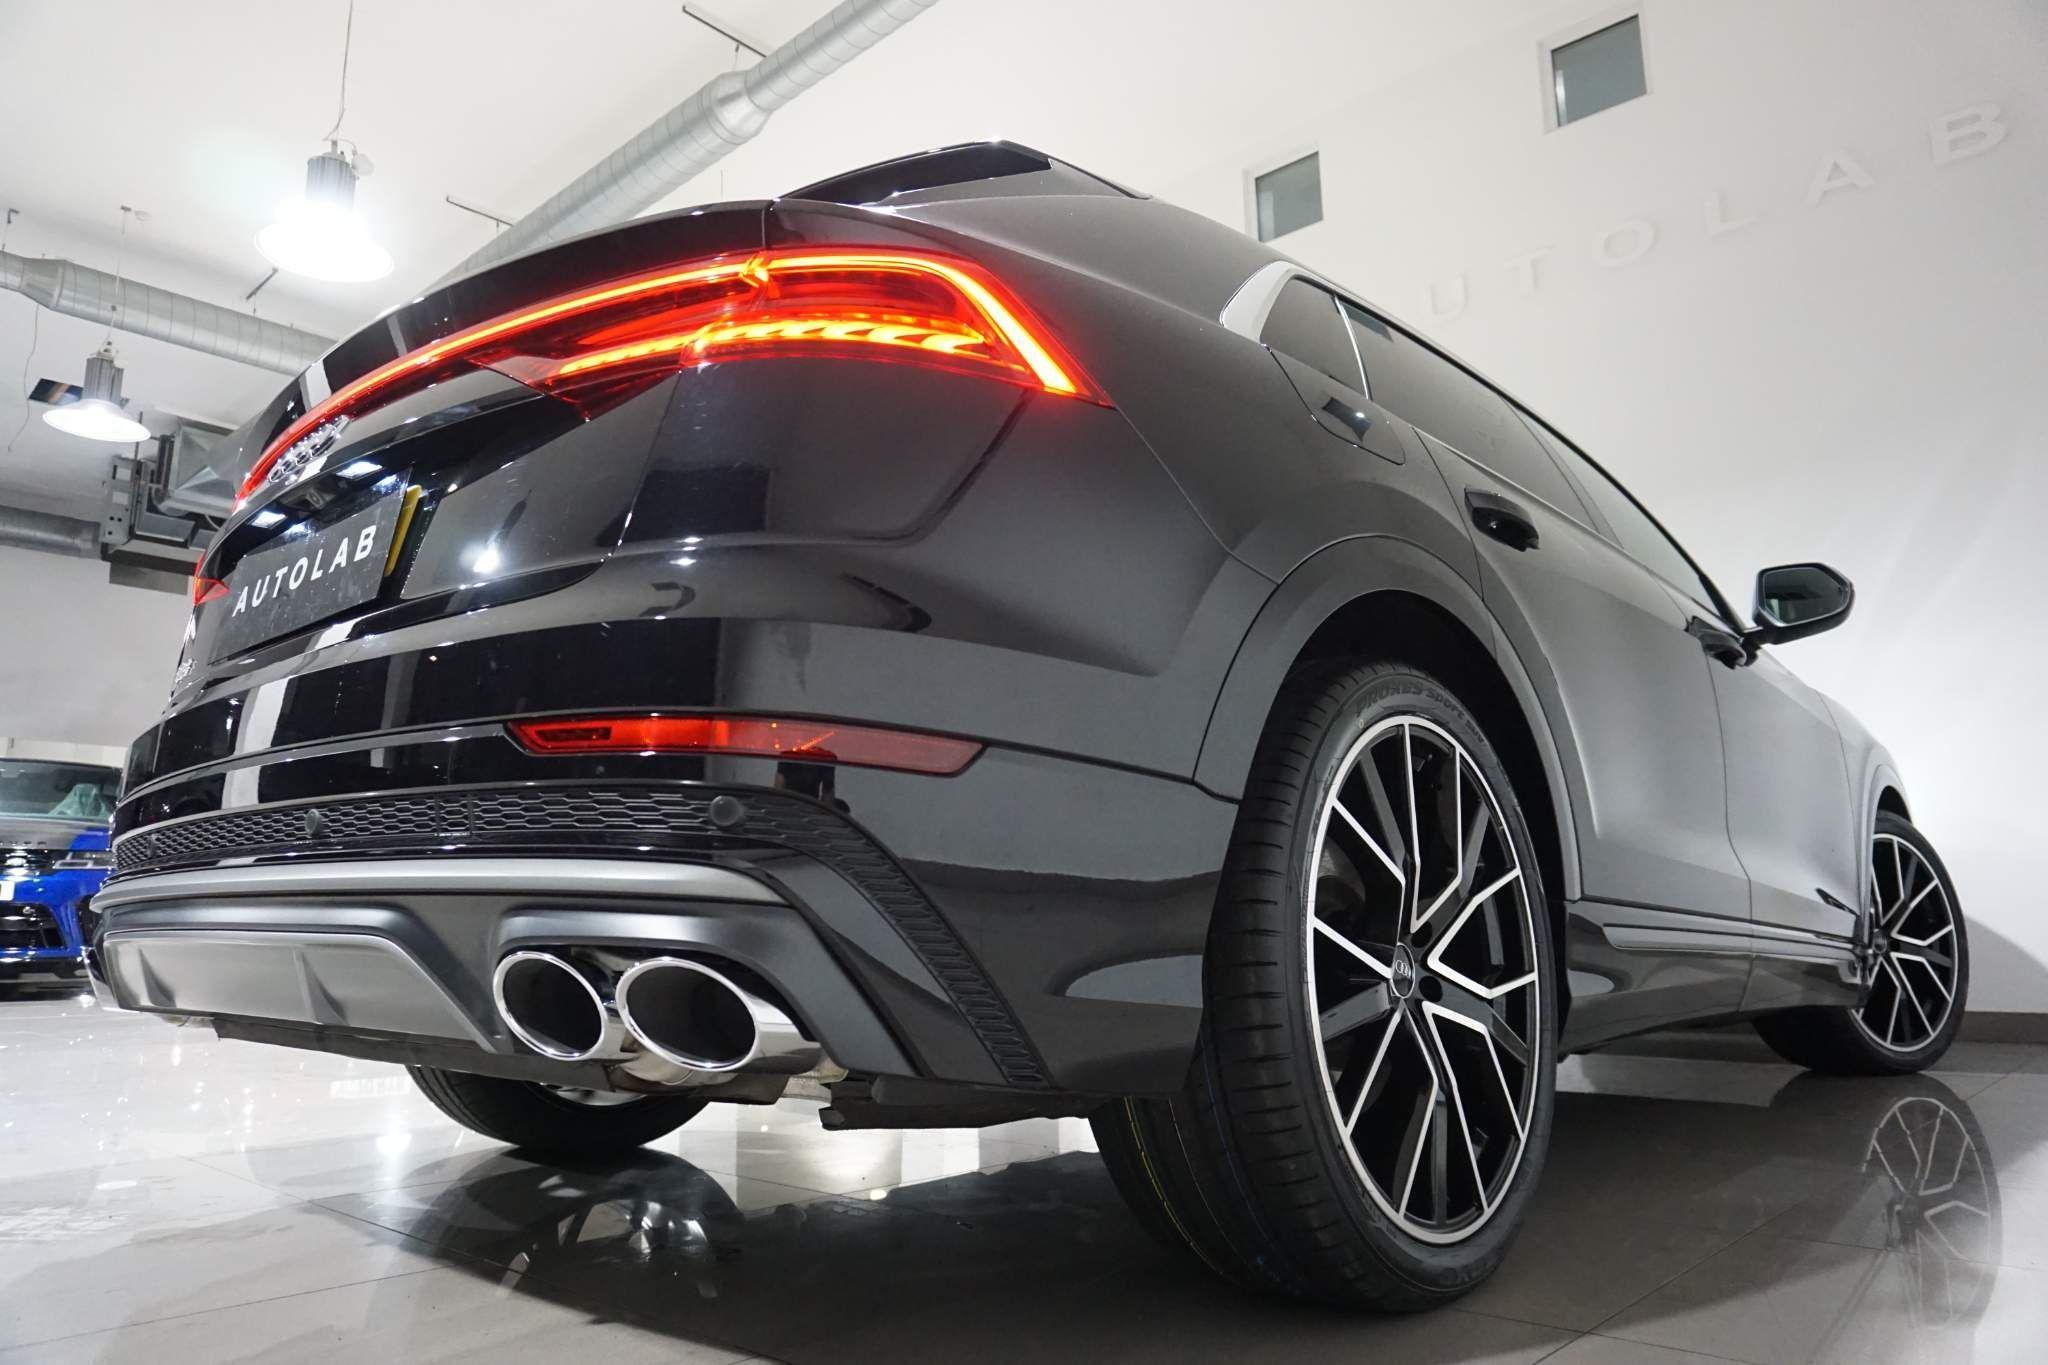 Audi Q8 3.0 TDI V6 50 S line Tiptronic quattro (s/s) 5dr